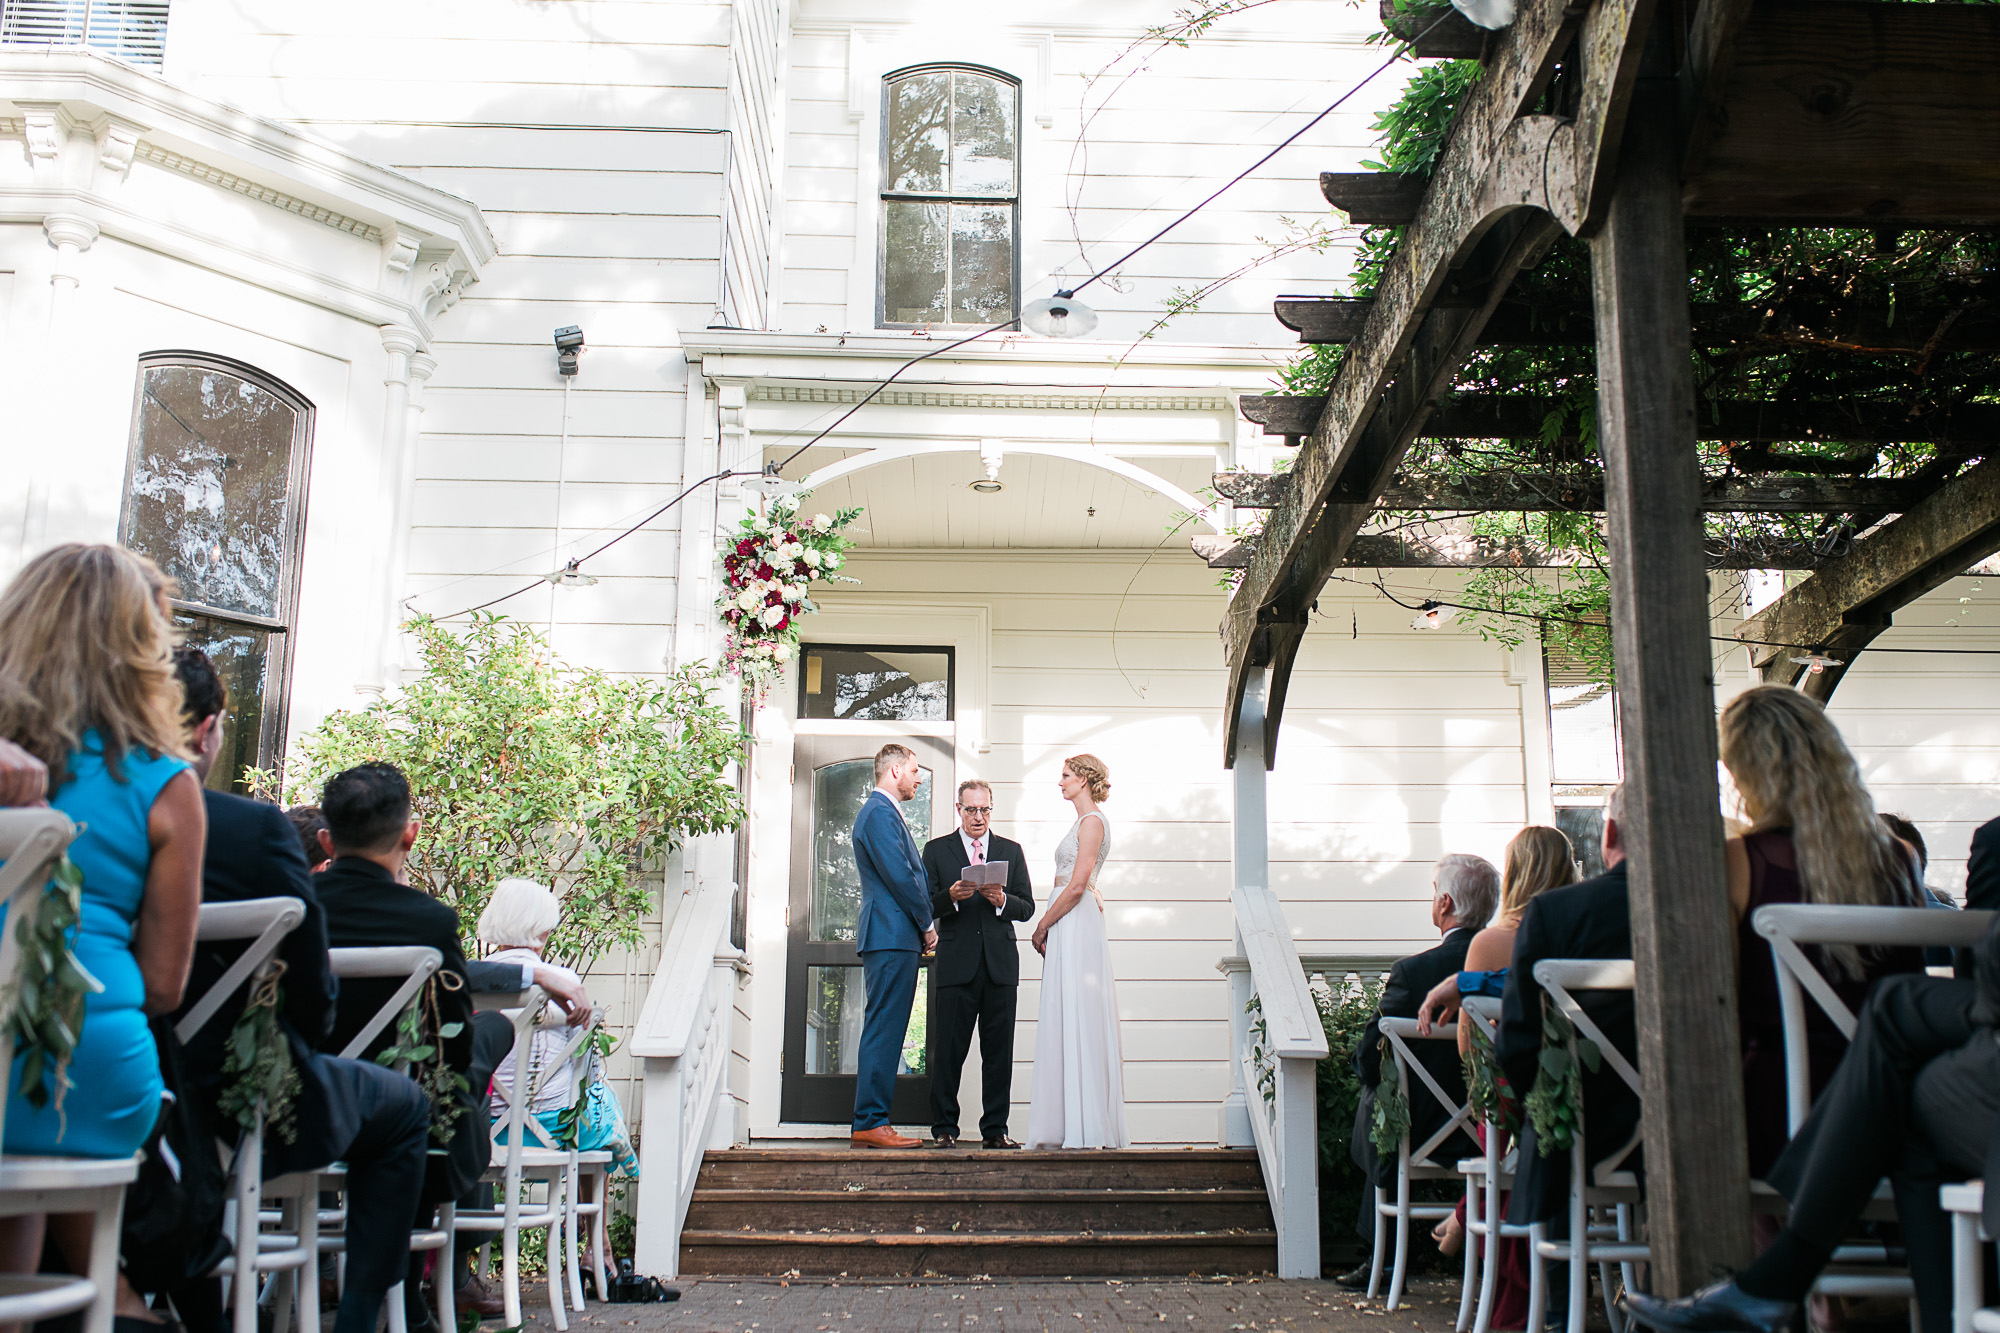 Generals Daughter Wedding Photos by JBJ Pictures - Ramekins Wedding Venue Photographer in Sonoma, Napa (26).jpg